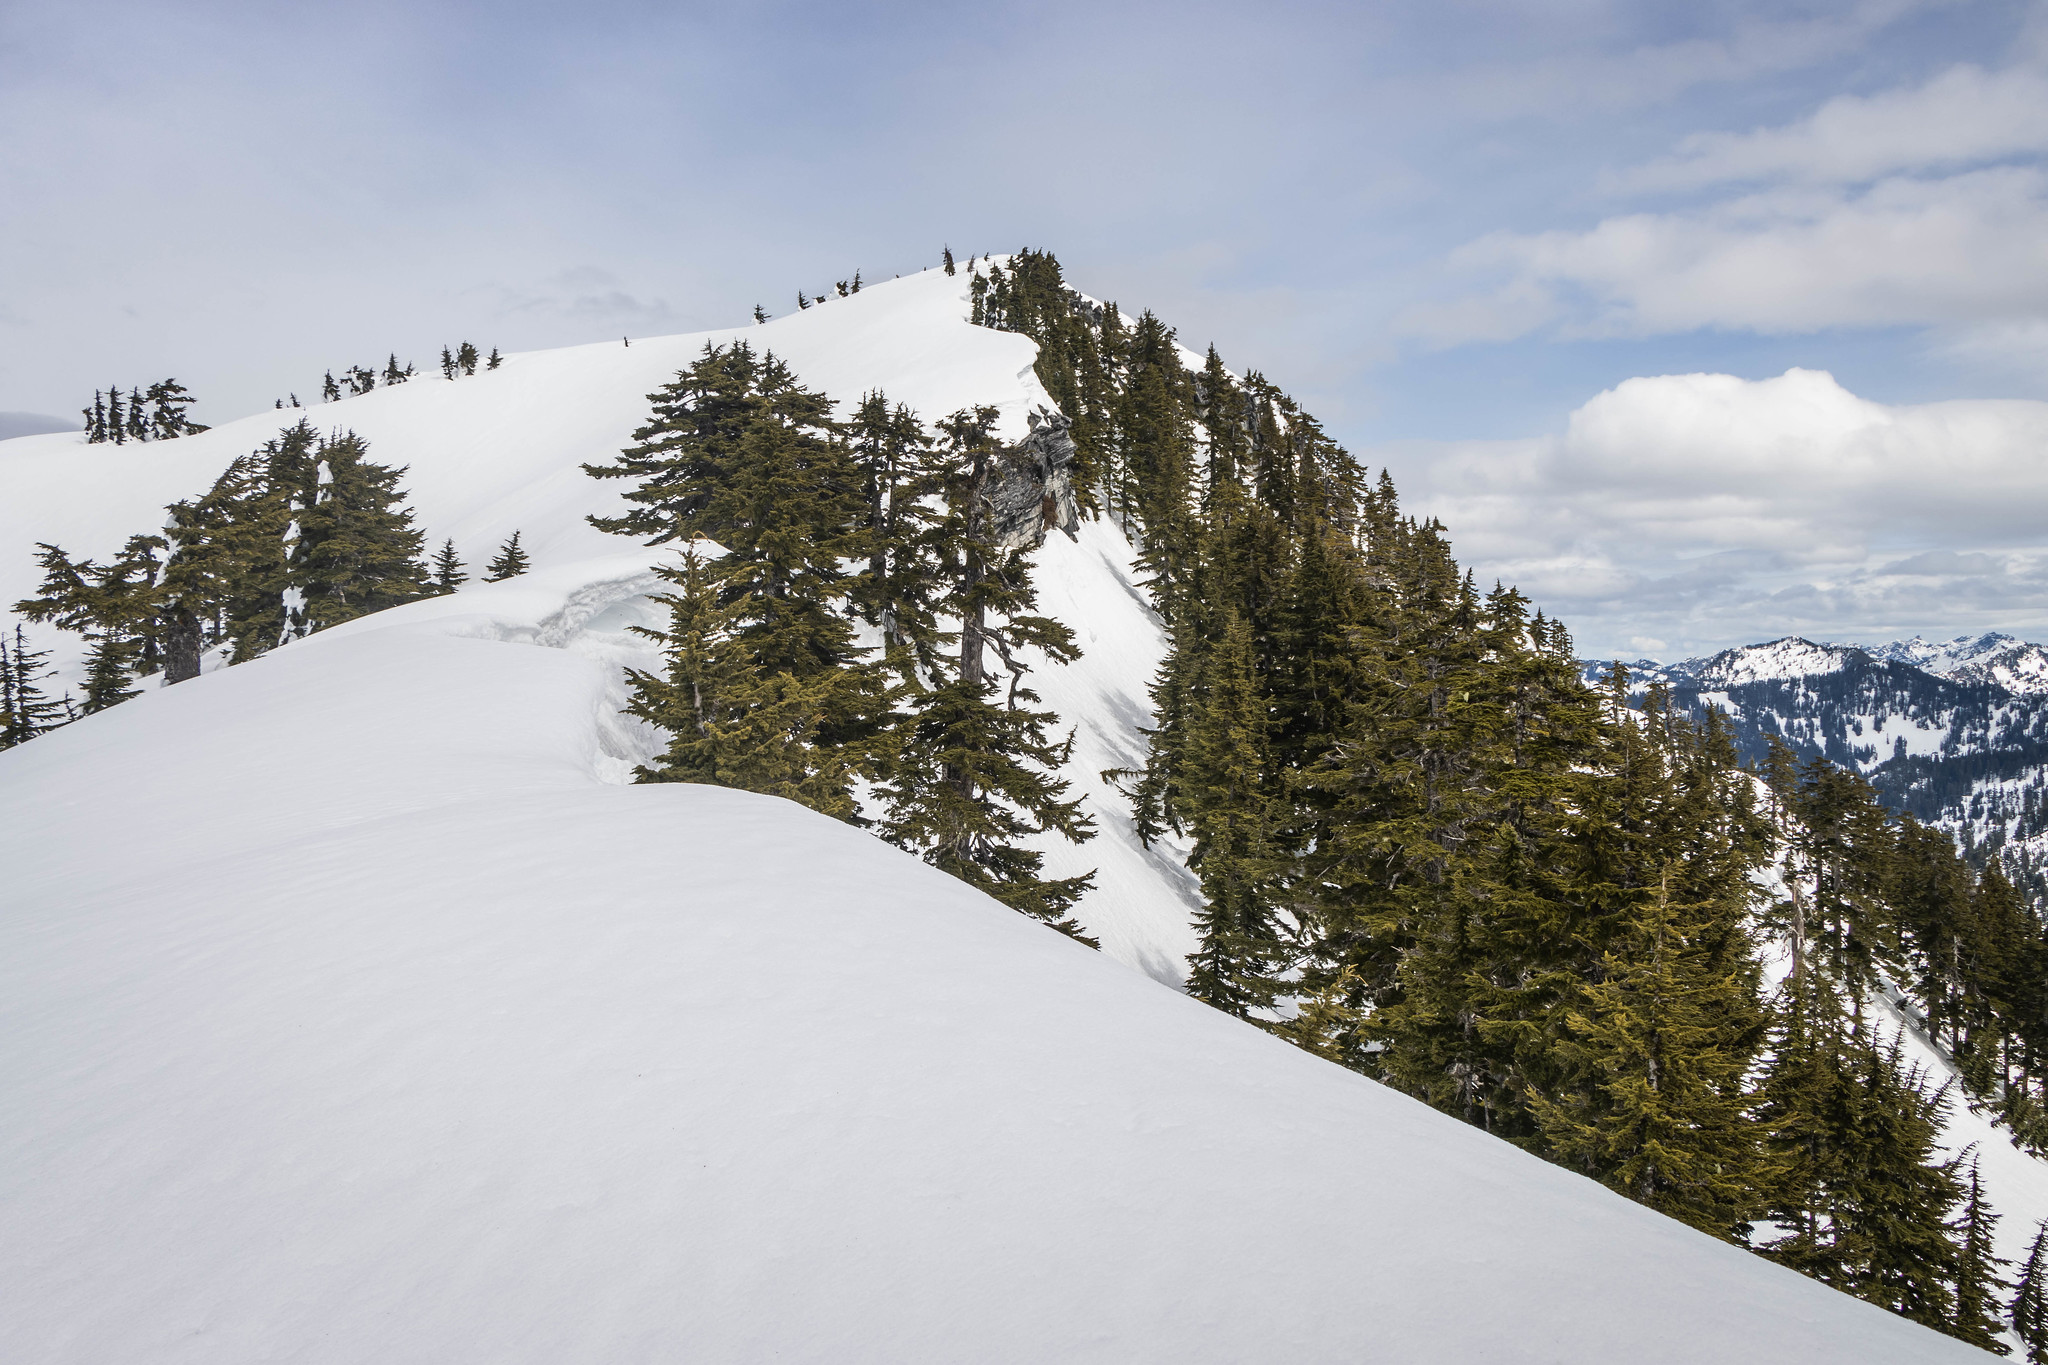 Paperboy's southwest ridge